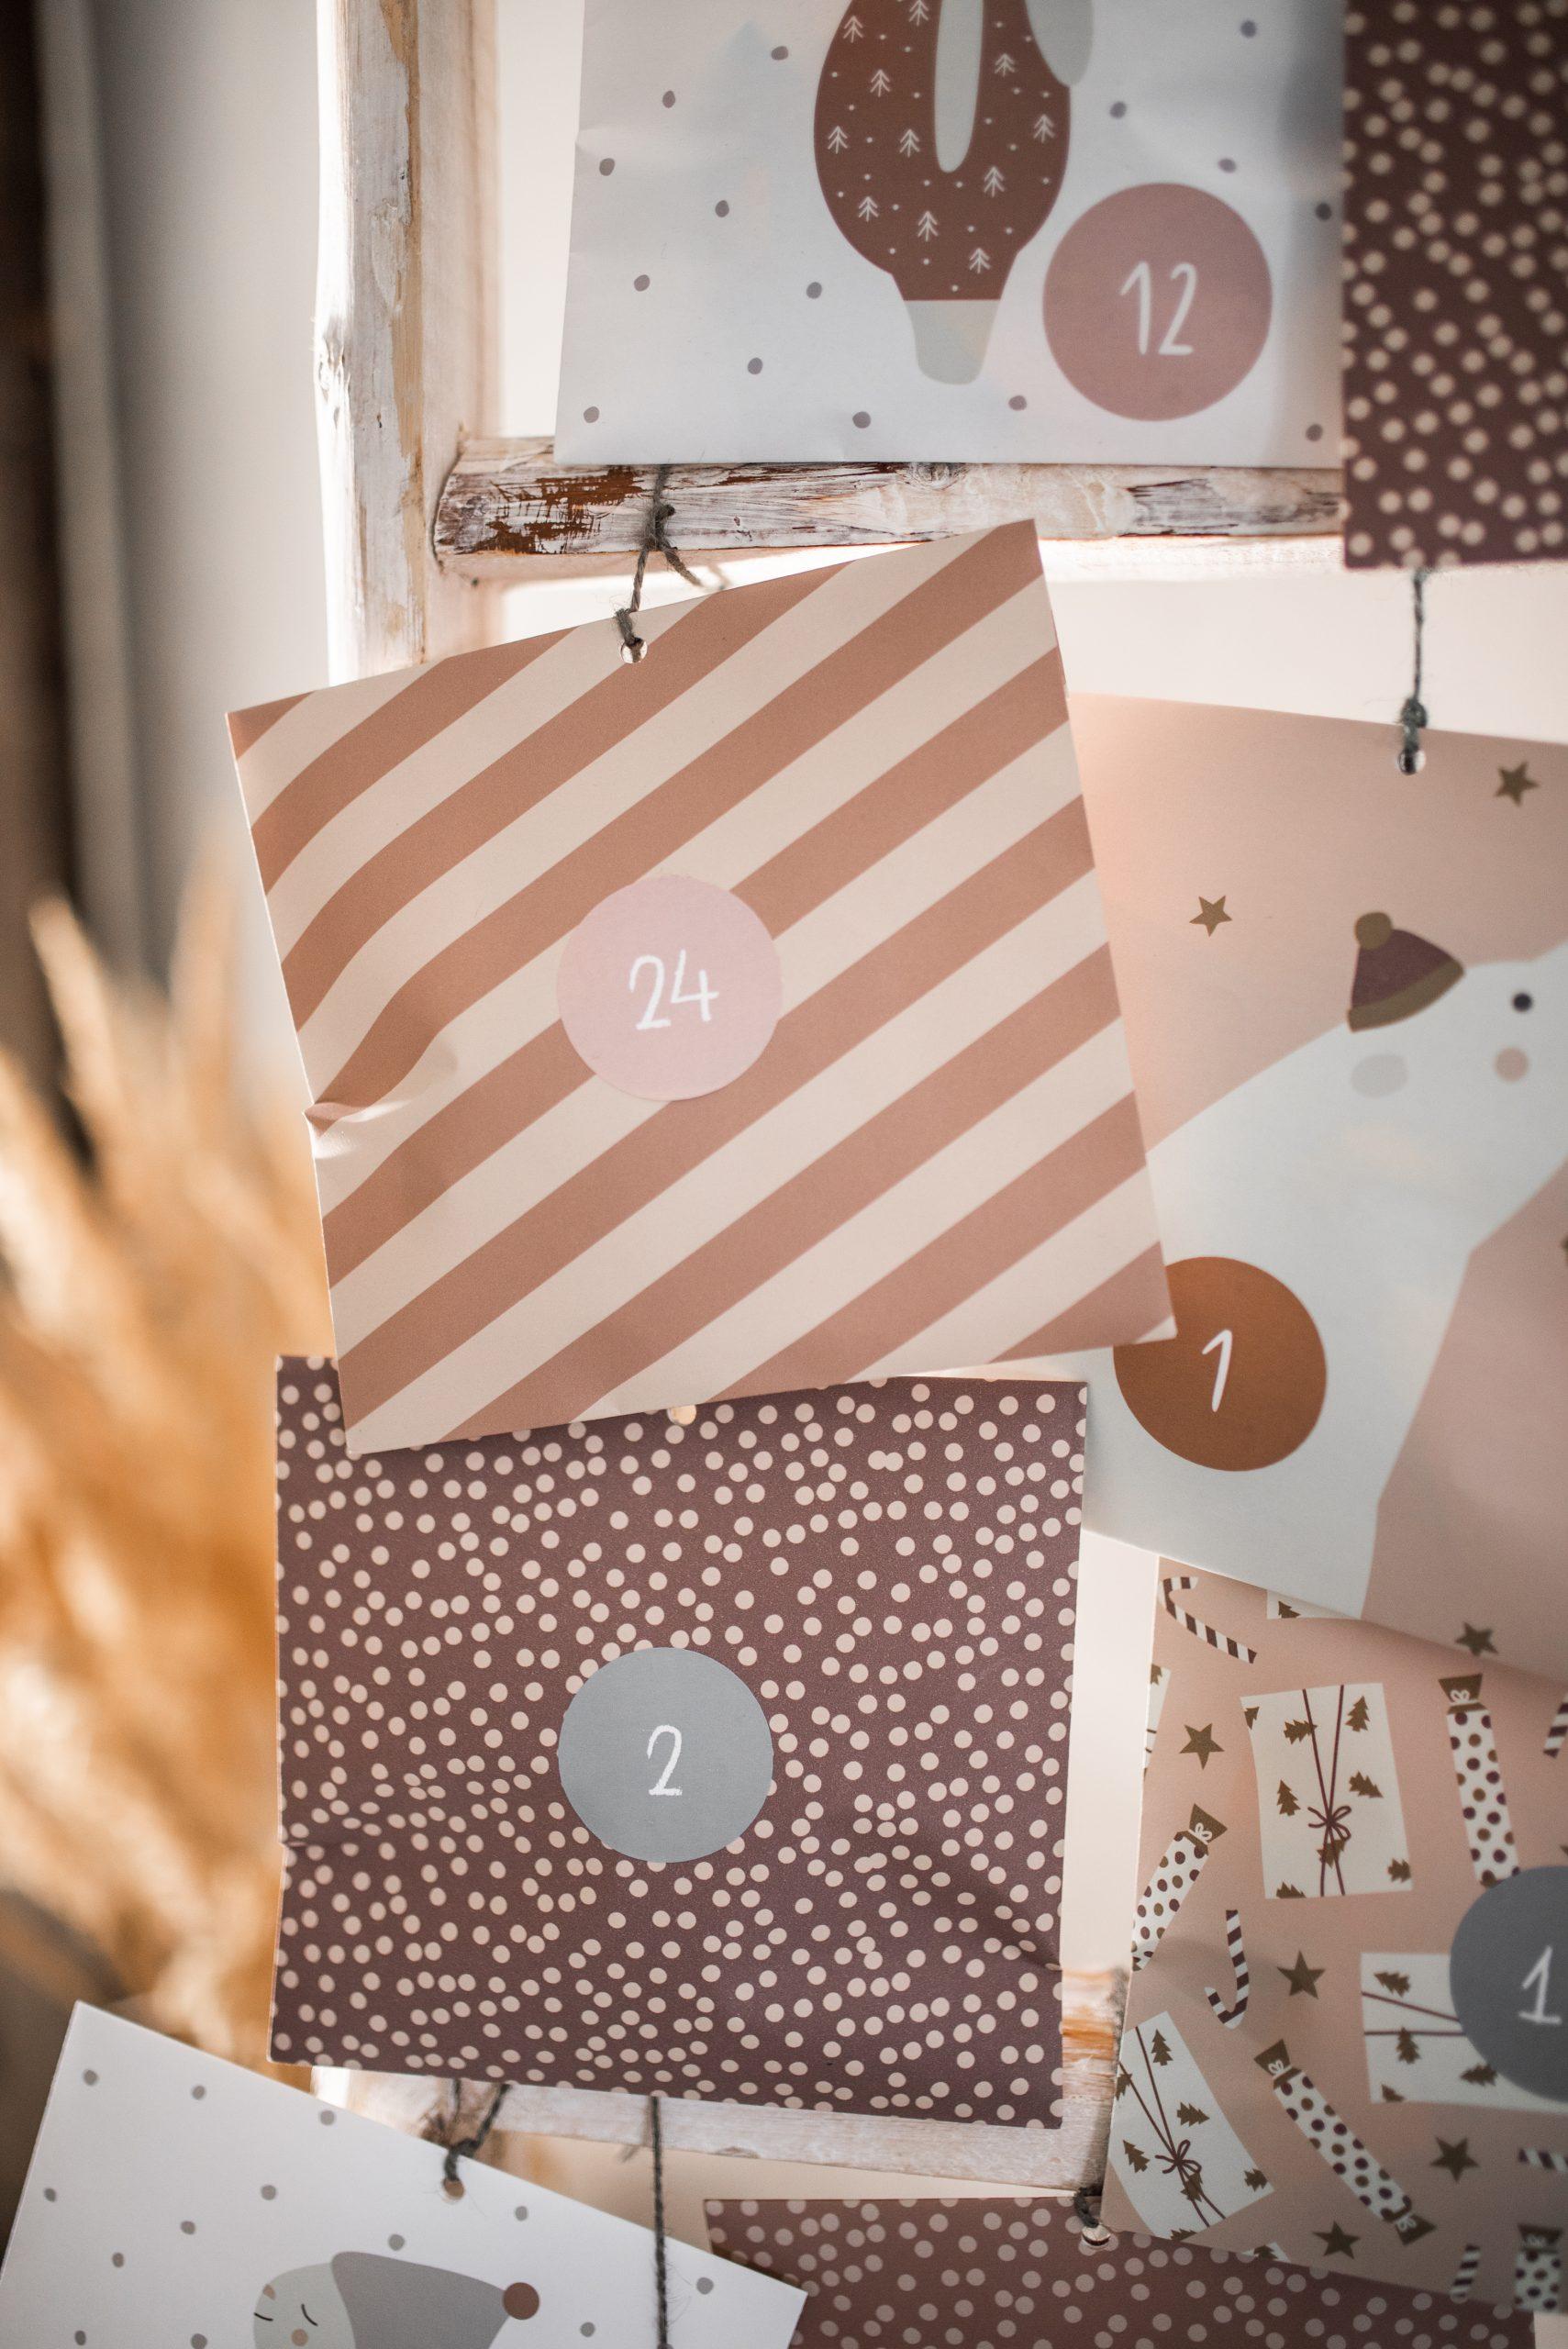 Adventskalender-Papiertüten(auch zum Verschenken), Recyclingpapier, Ava & Yves